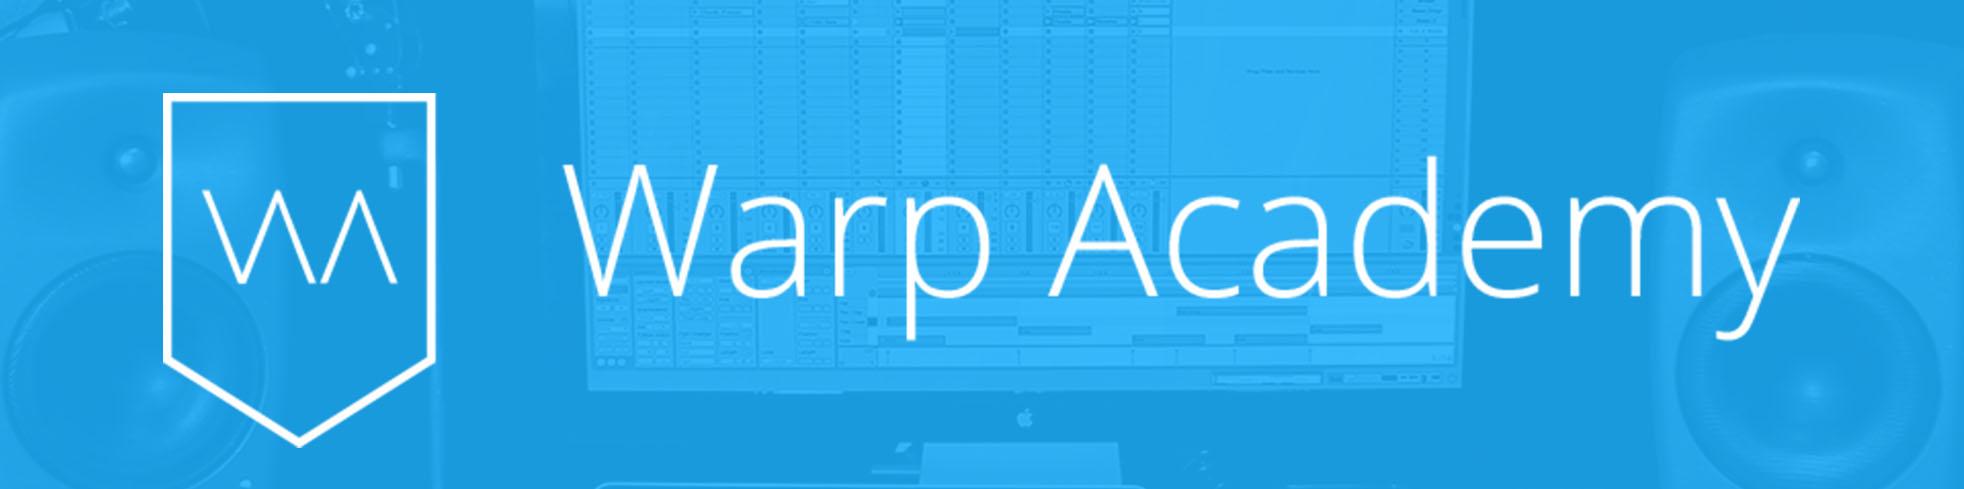 Warp Academy - Ableton Live